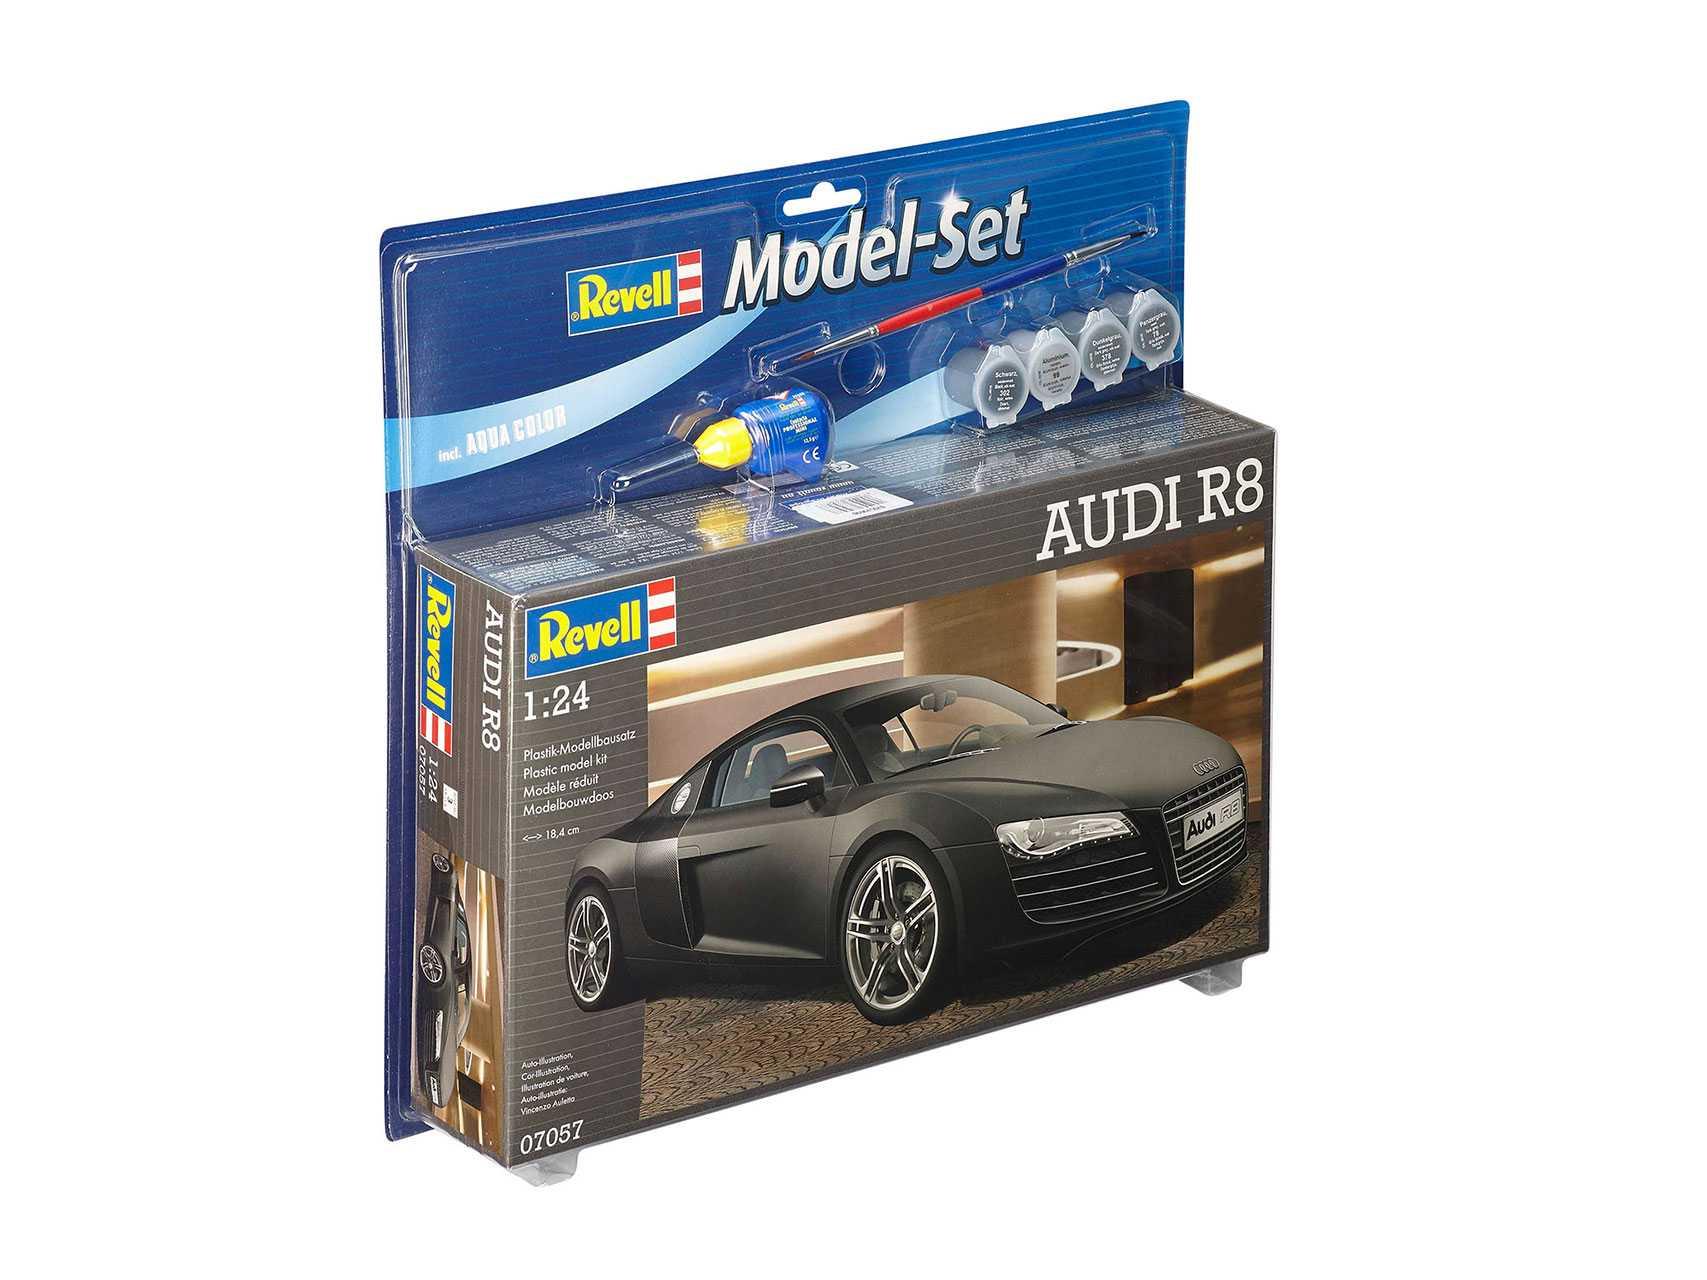 1/24 Plastikový model Set - auto 67057 - Audi R8